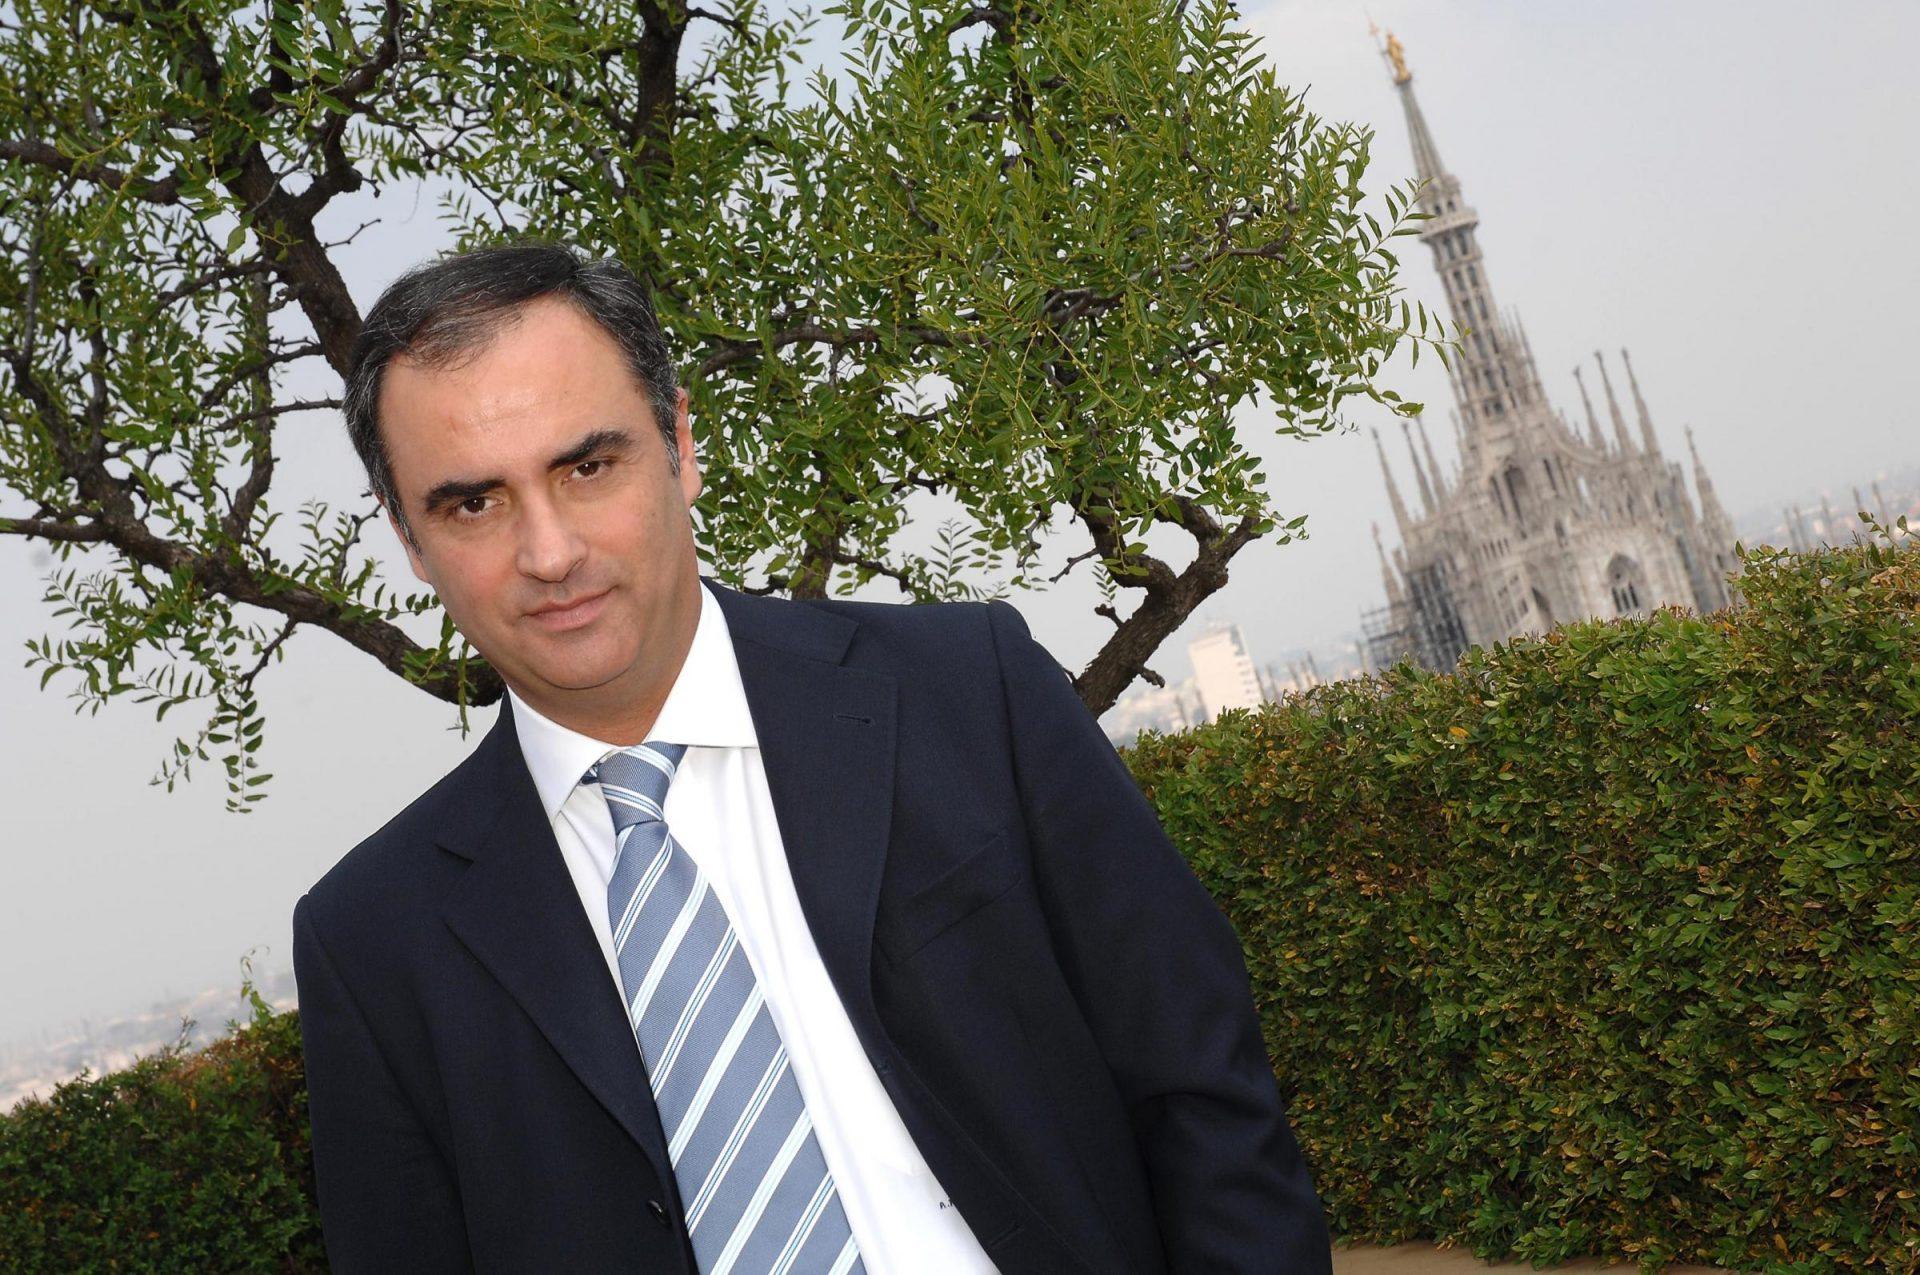 Sandro Piccinini, addio Mediaset e approda a Sky: